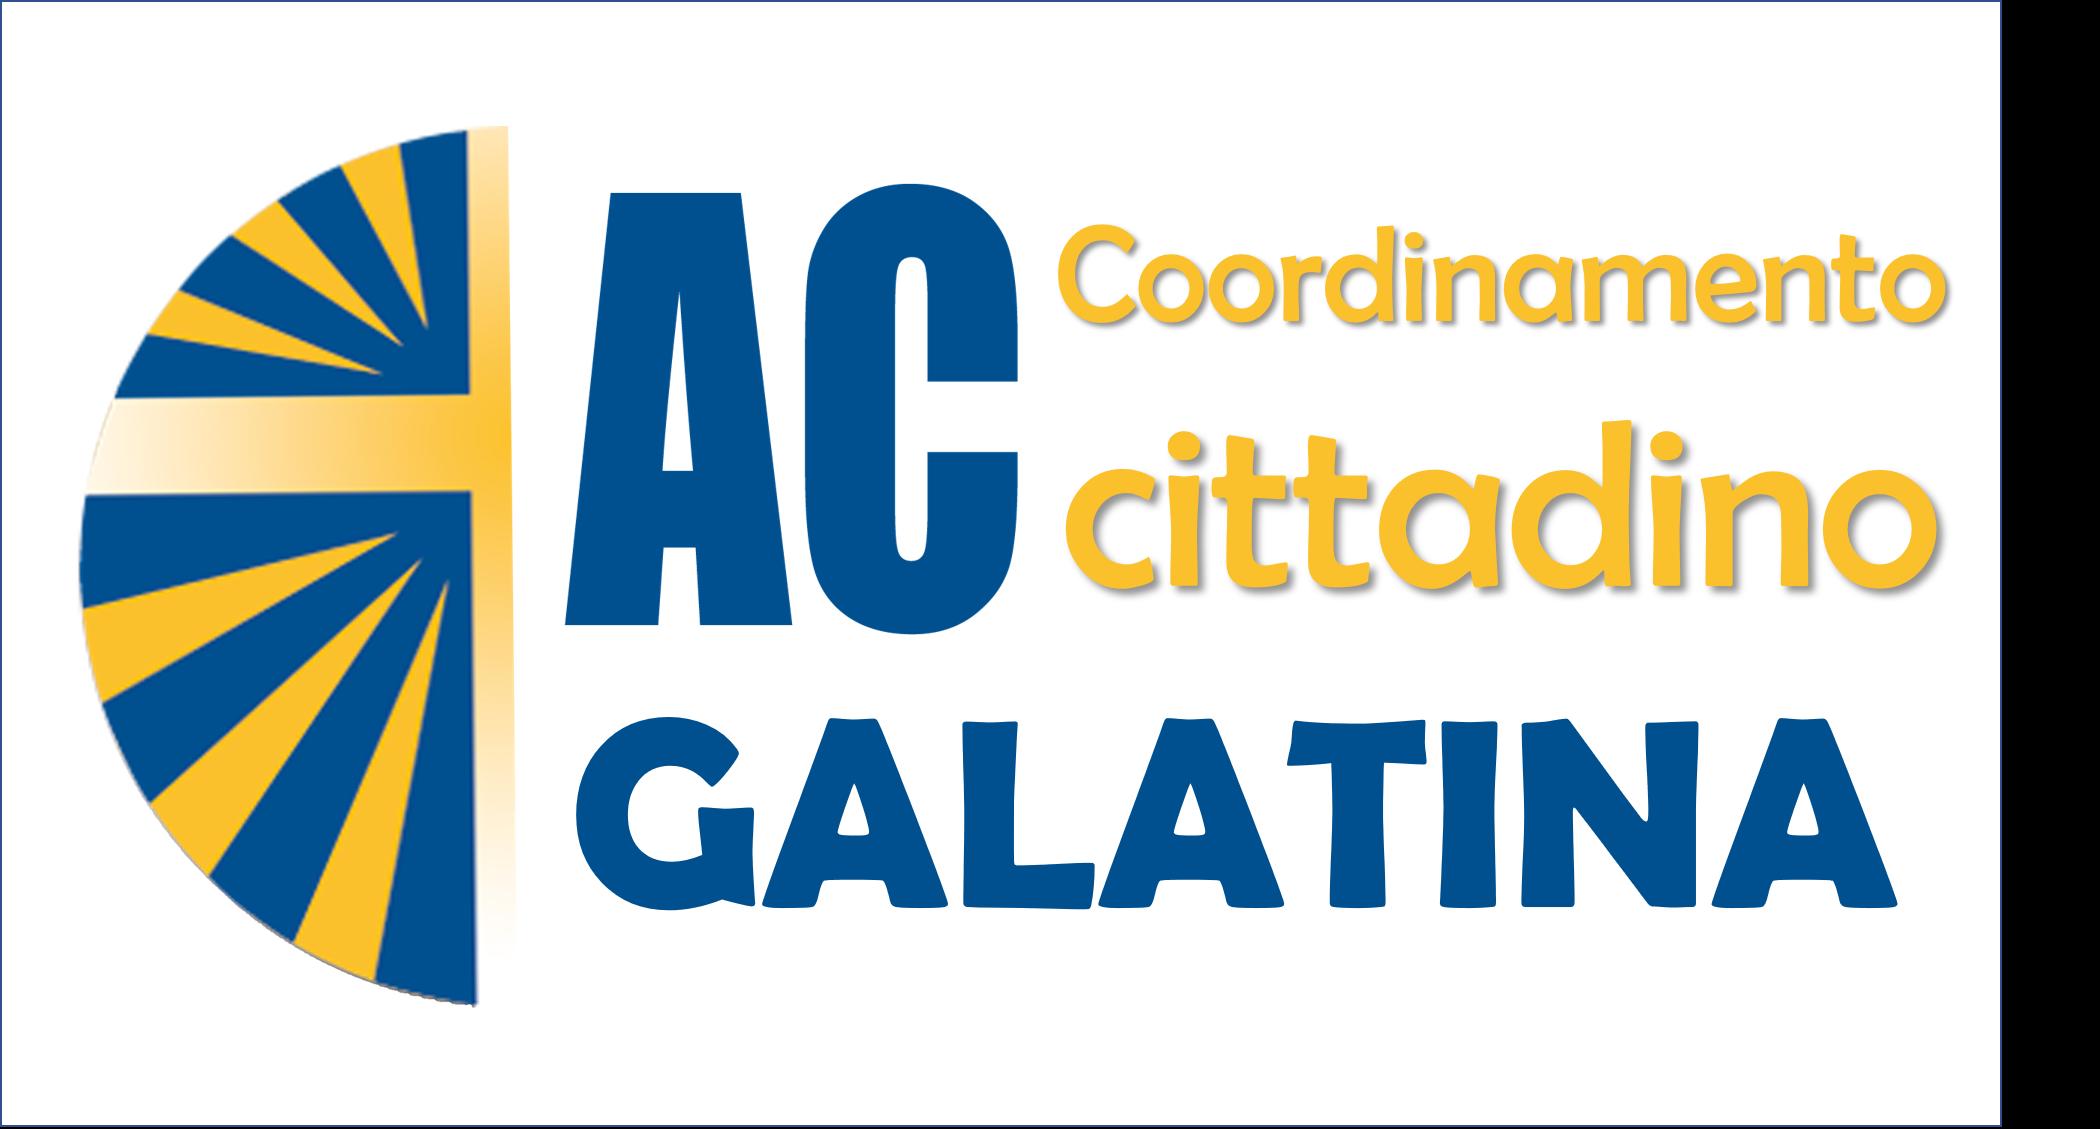 Coordinamento cittadino Ac